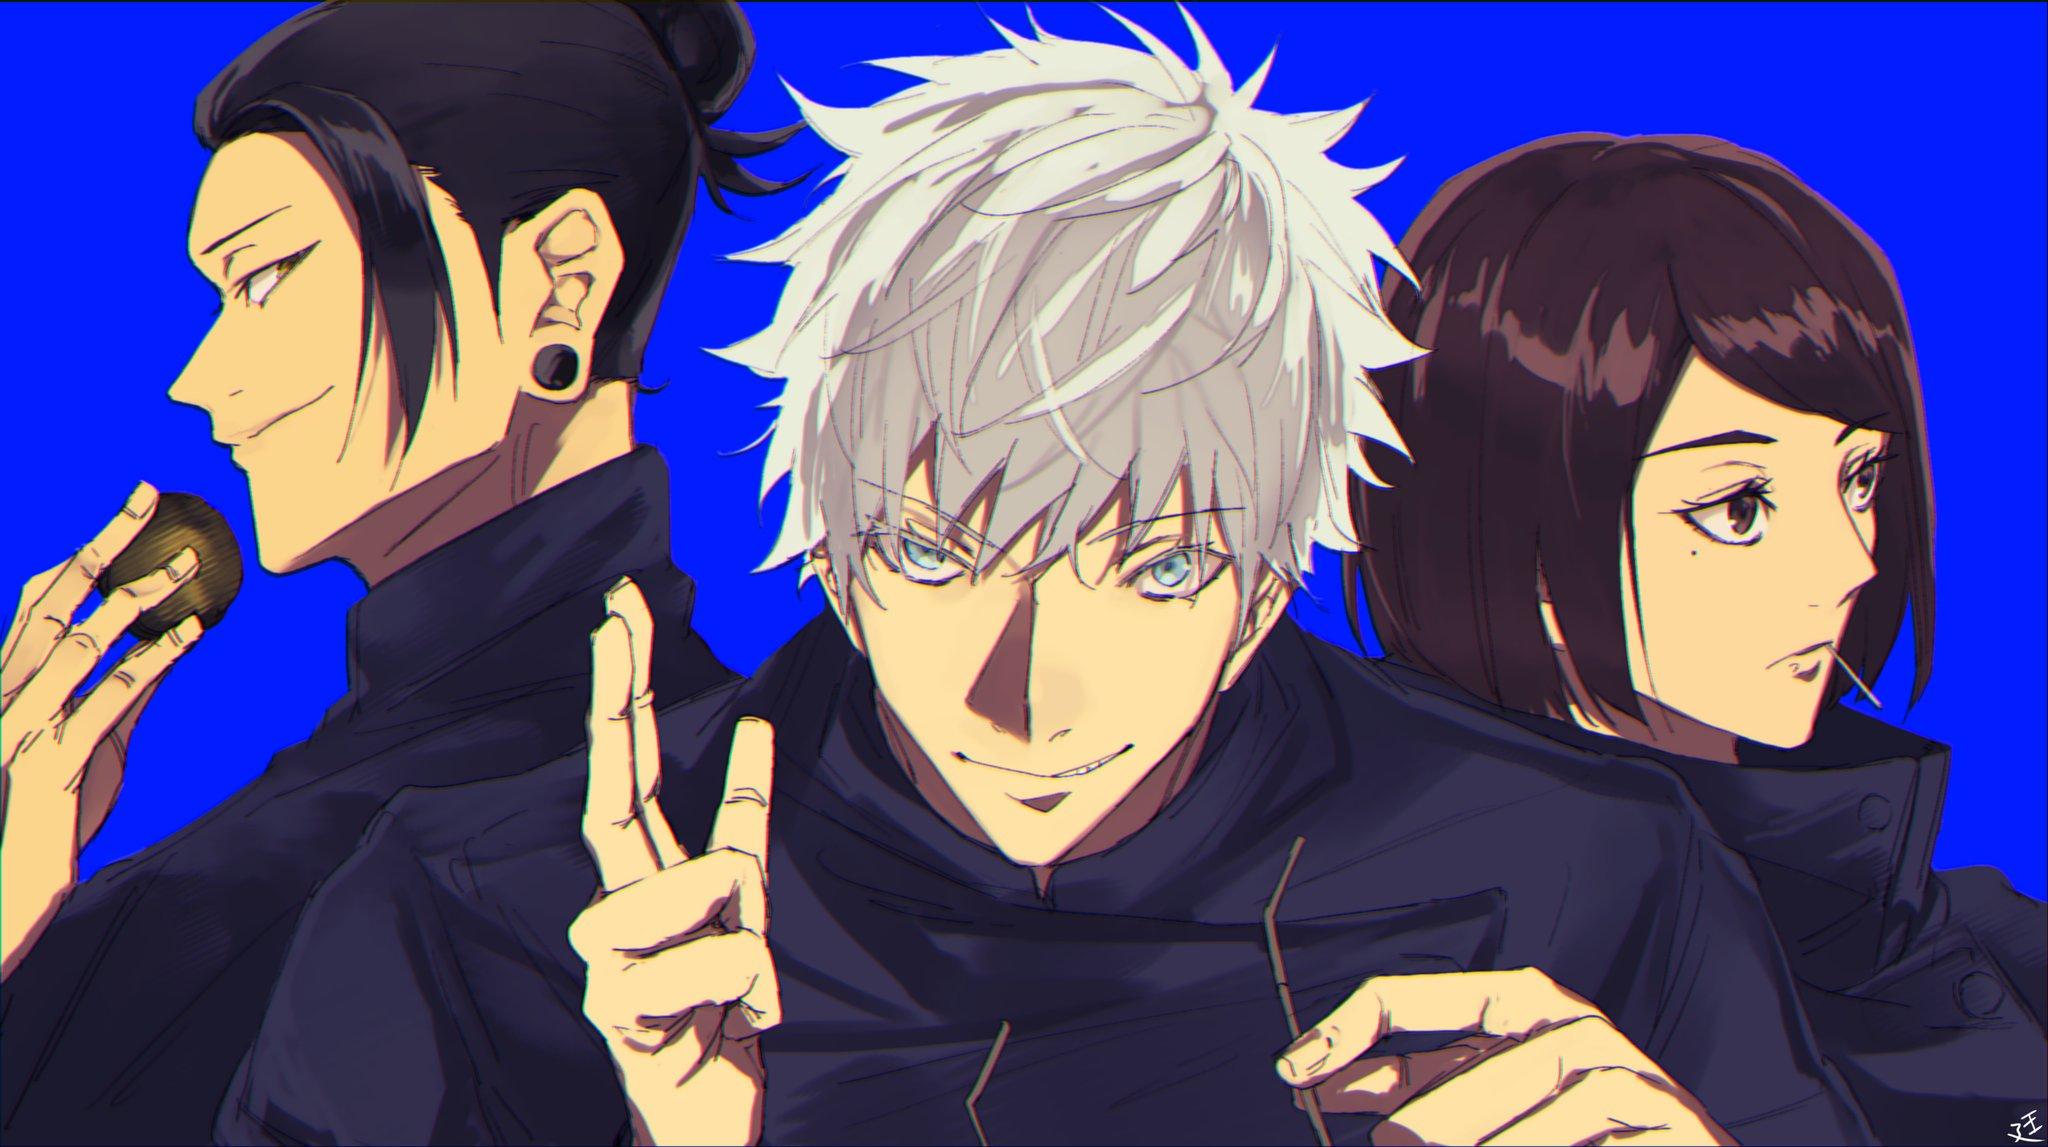 Satoru Gojo White Hair Blue Eyes Boy School Uniform Shoko Ieiri Girl Brown Hair Brown Eyes Suguru Ge 2048x1147